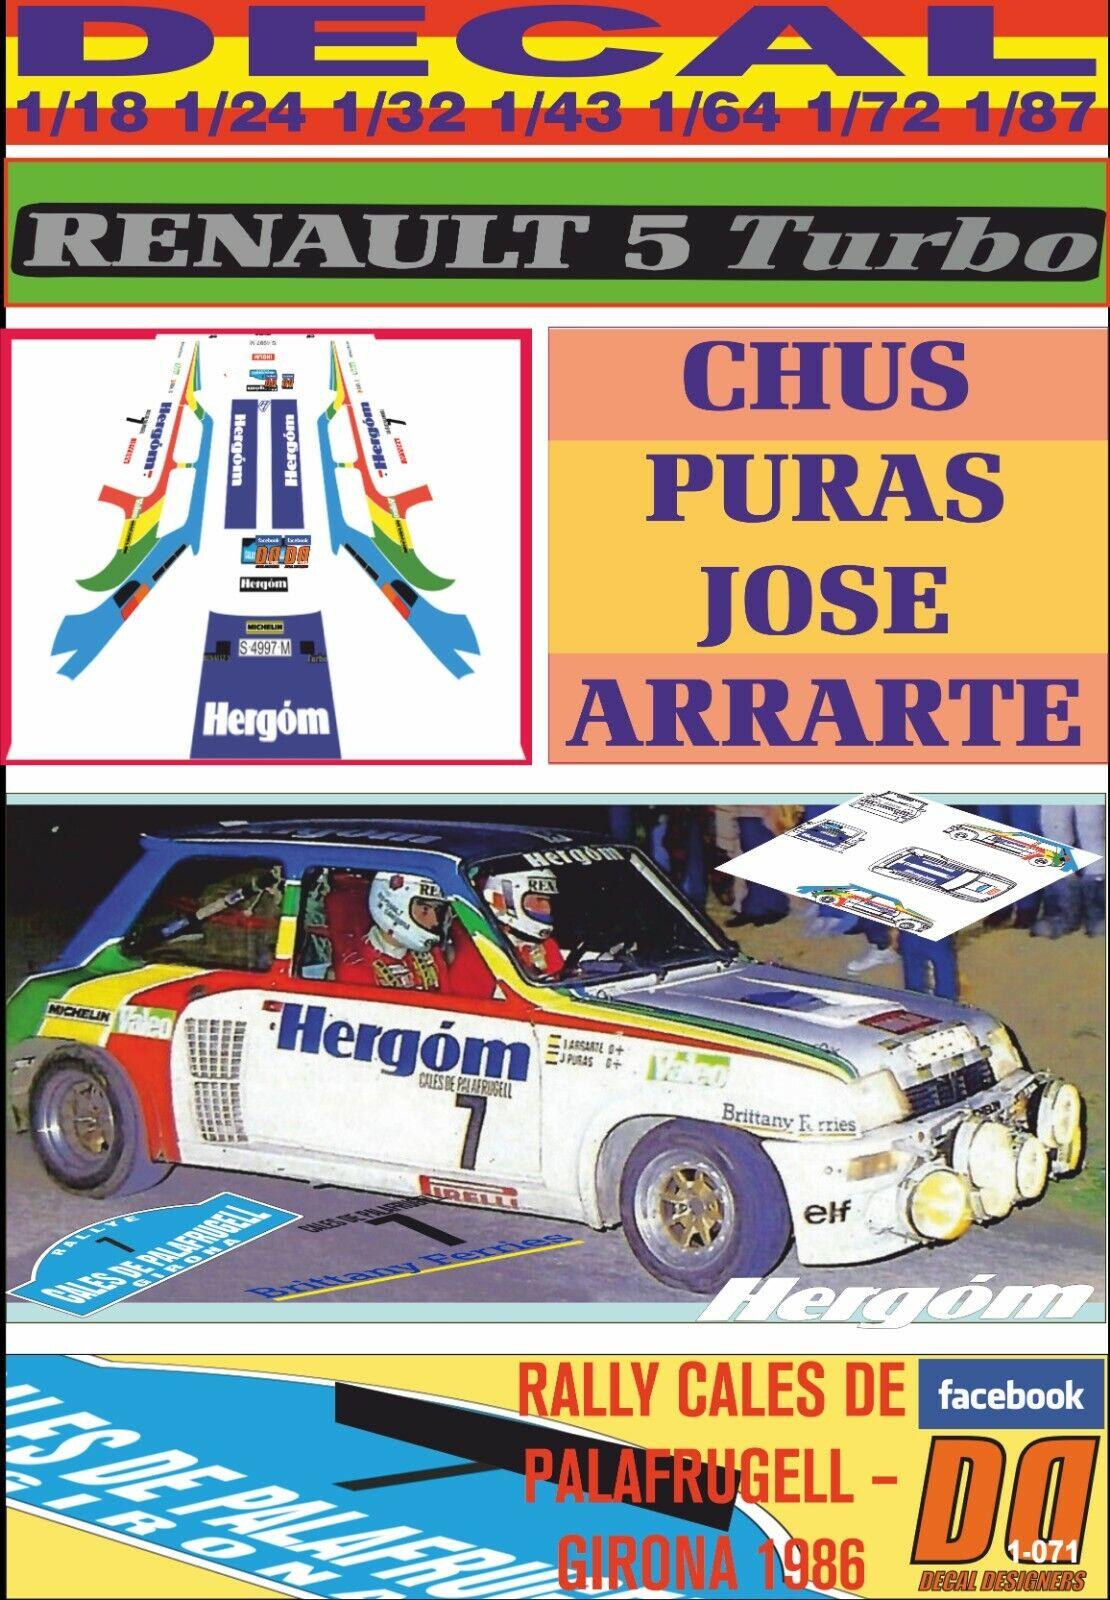 DECAL RENAULT 5 TURBO CHUS PURAS R.CALES DE PALAFRUGELL – GIRONA 1986 (09)